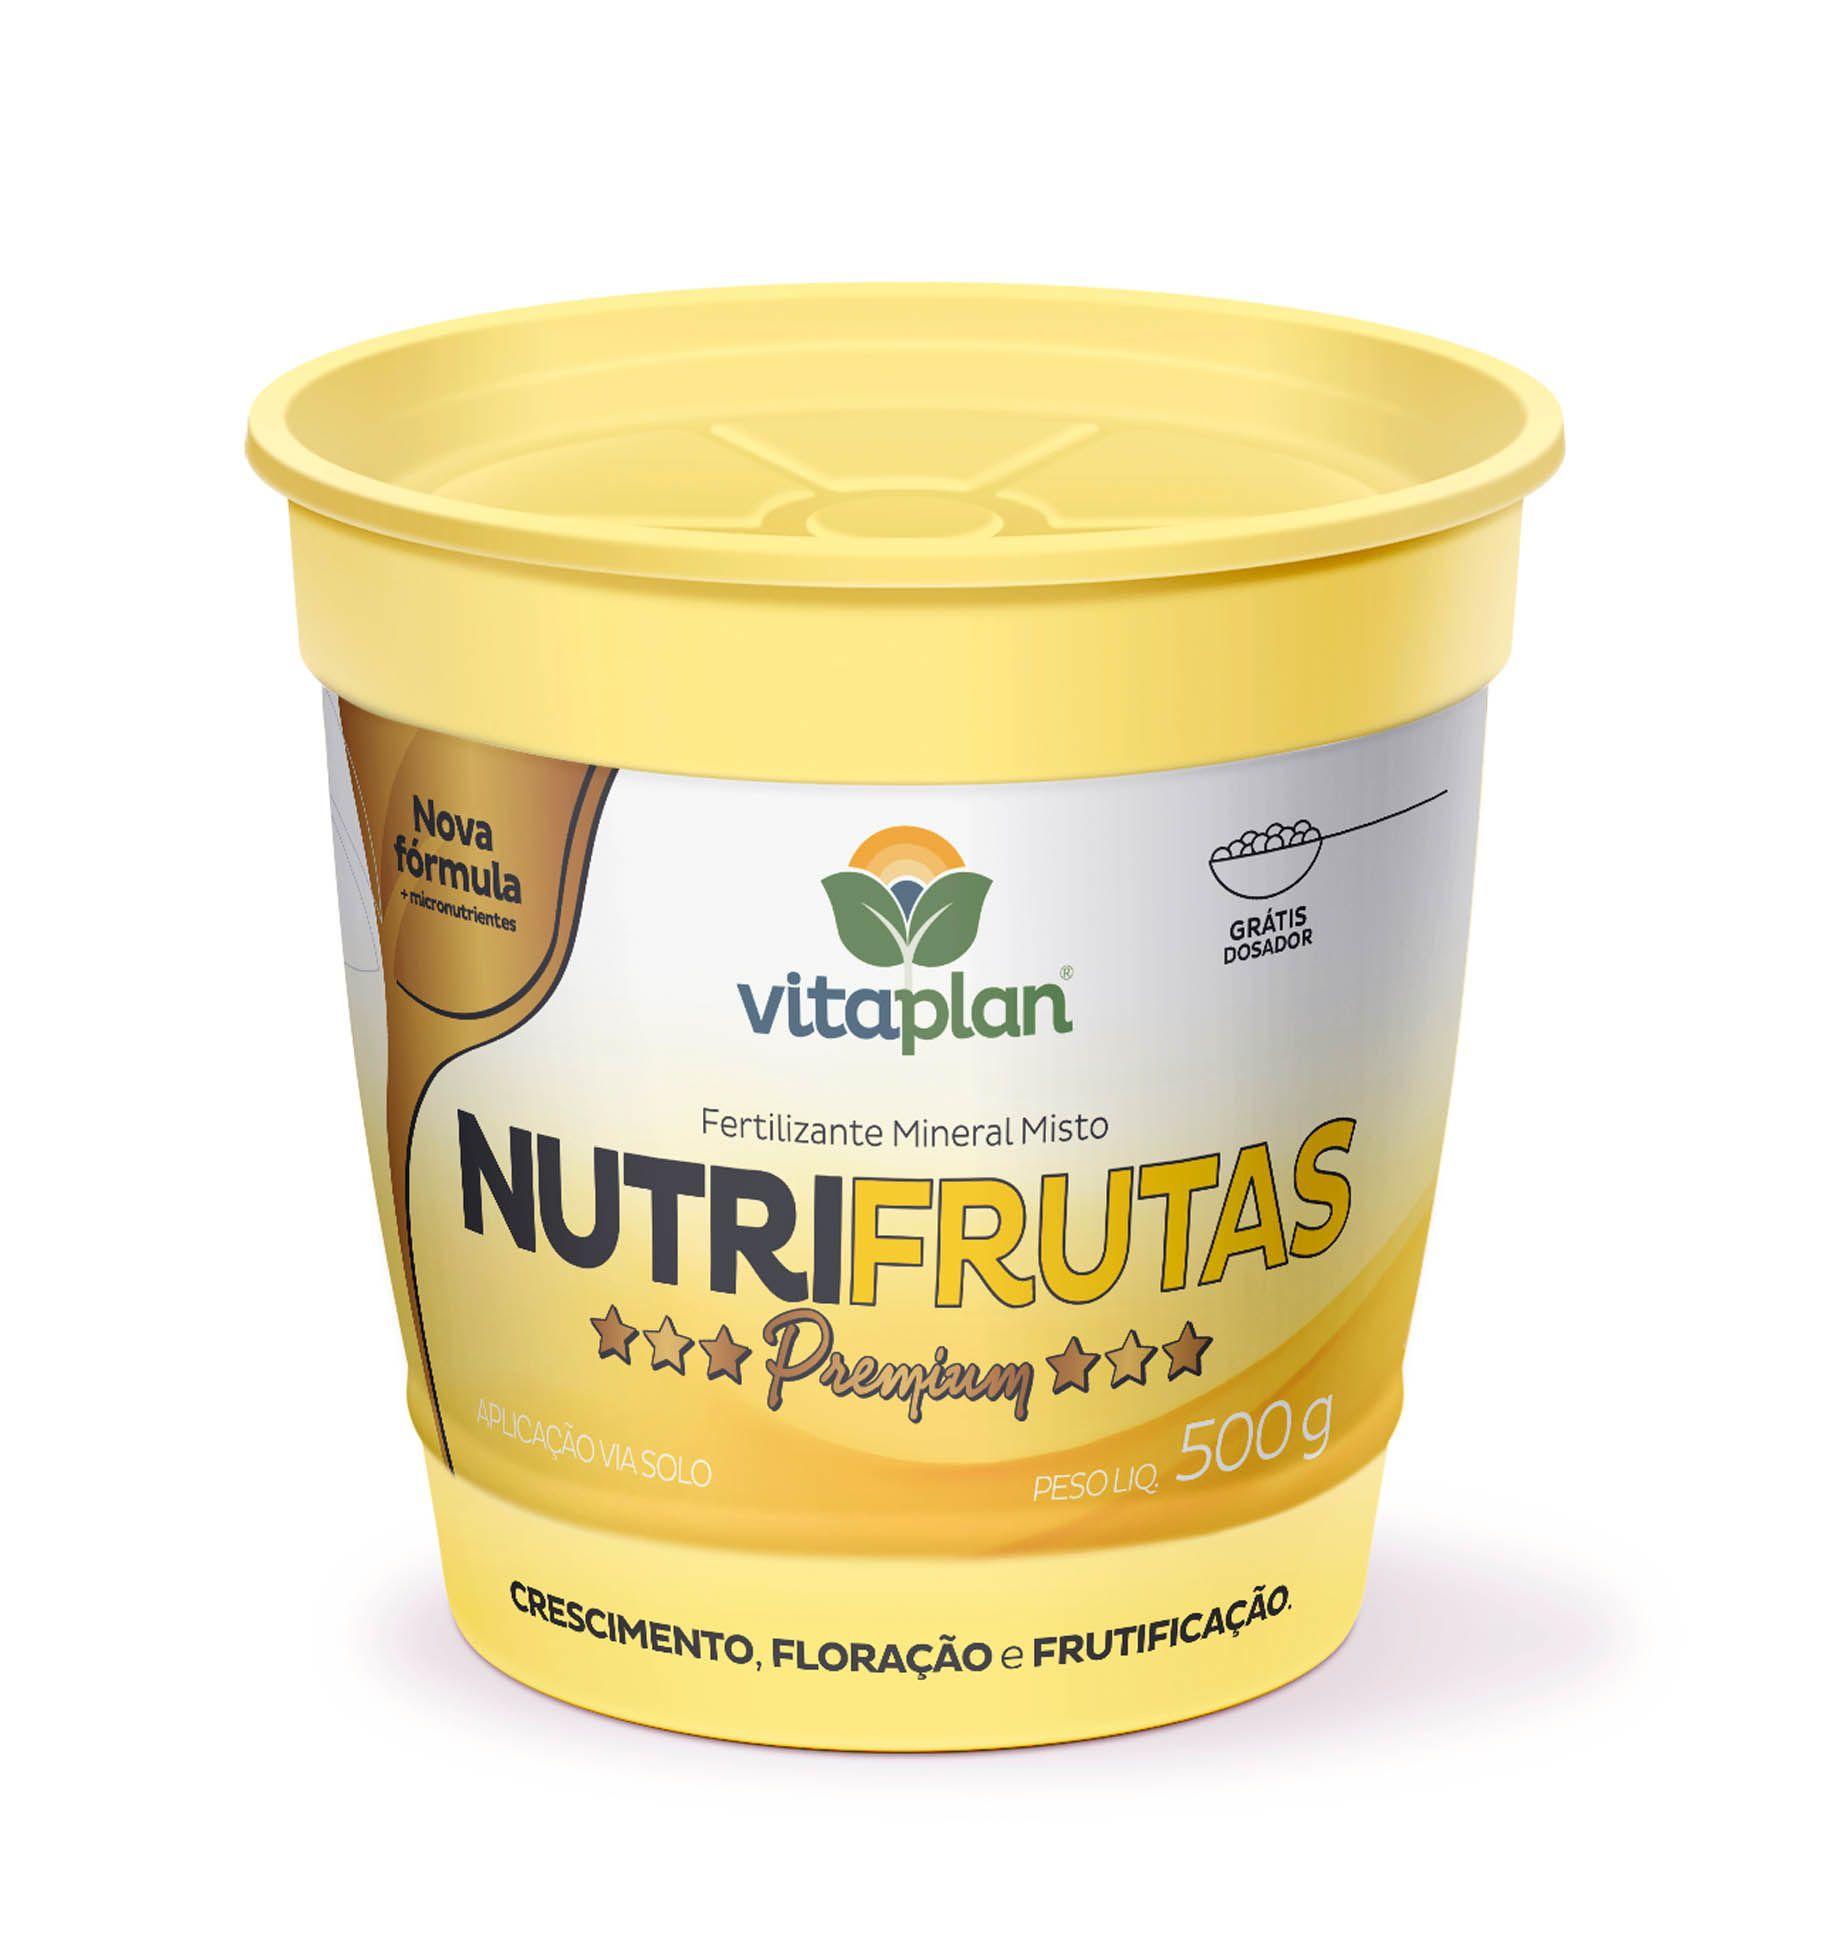 Fertilizante Mineral Misto Nutrifrutas 500g - Vitaplan Premium